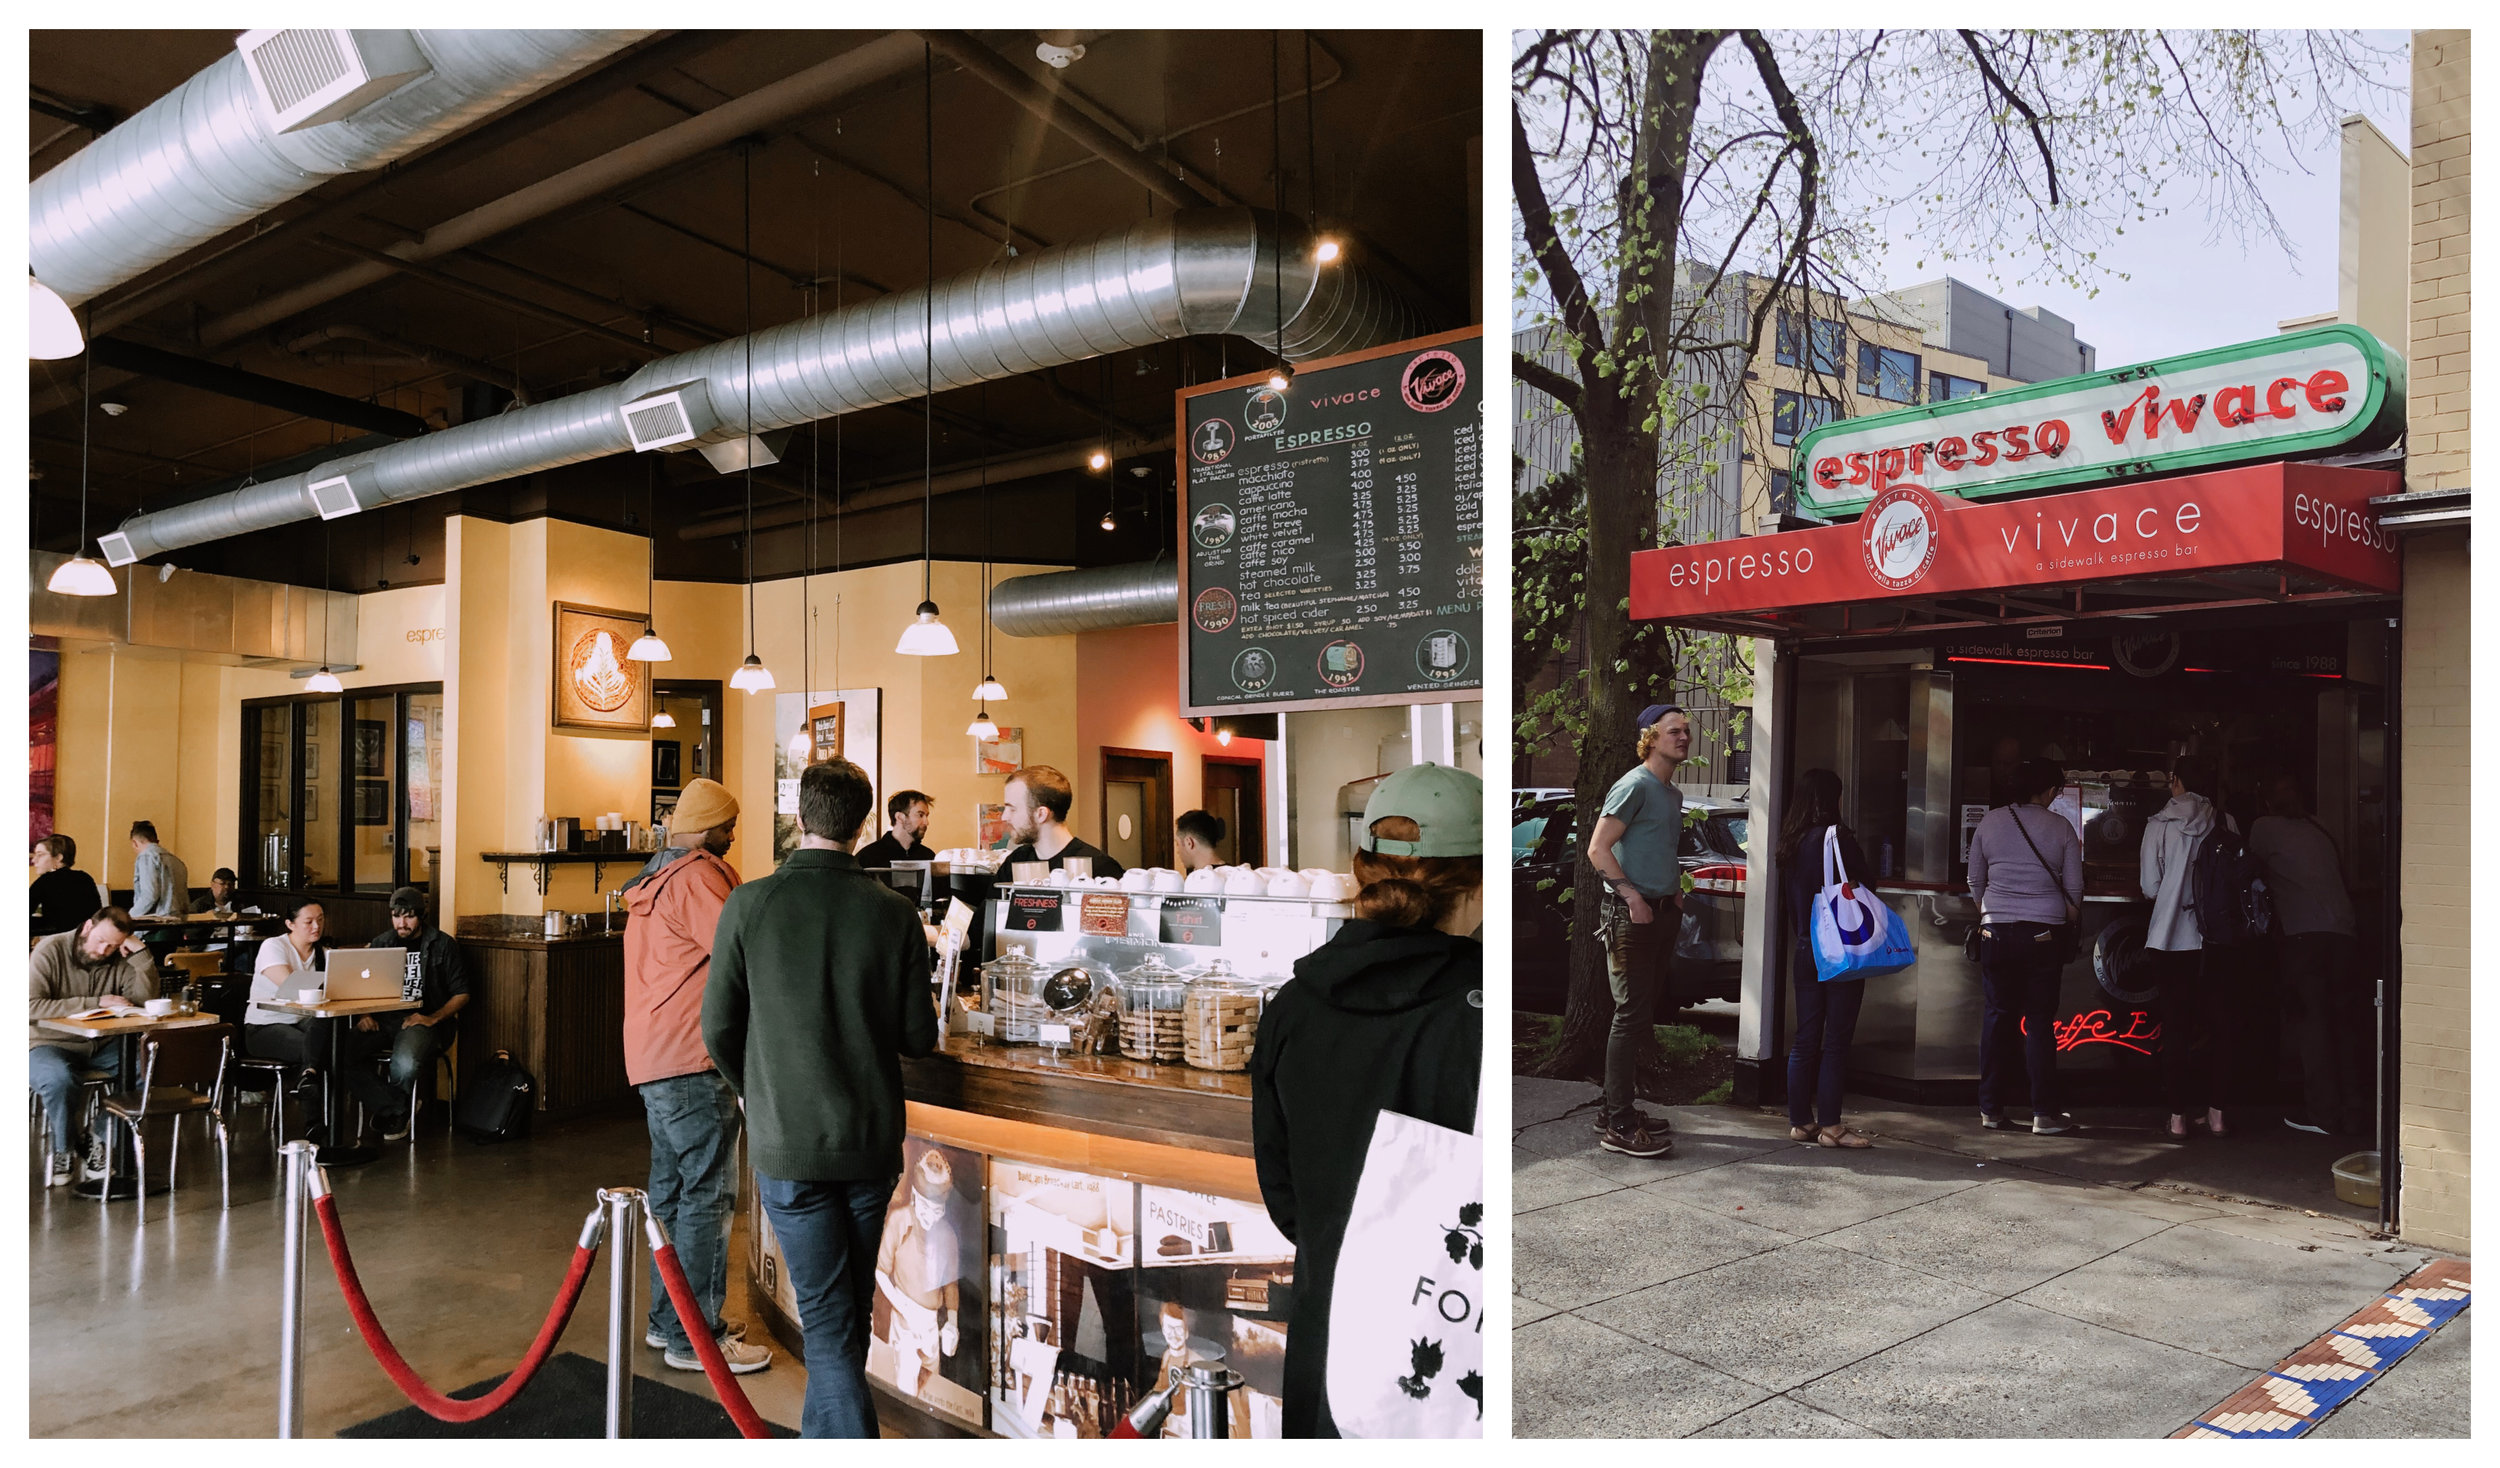 Espresso Vivace Flagship & Espresso Vivace Walk-up Bar